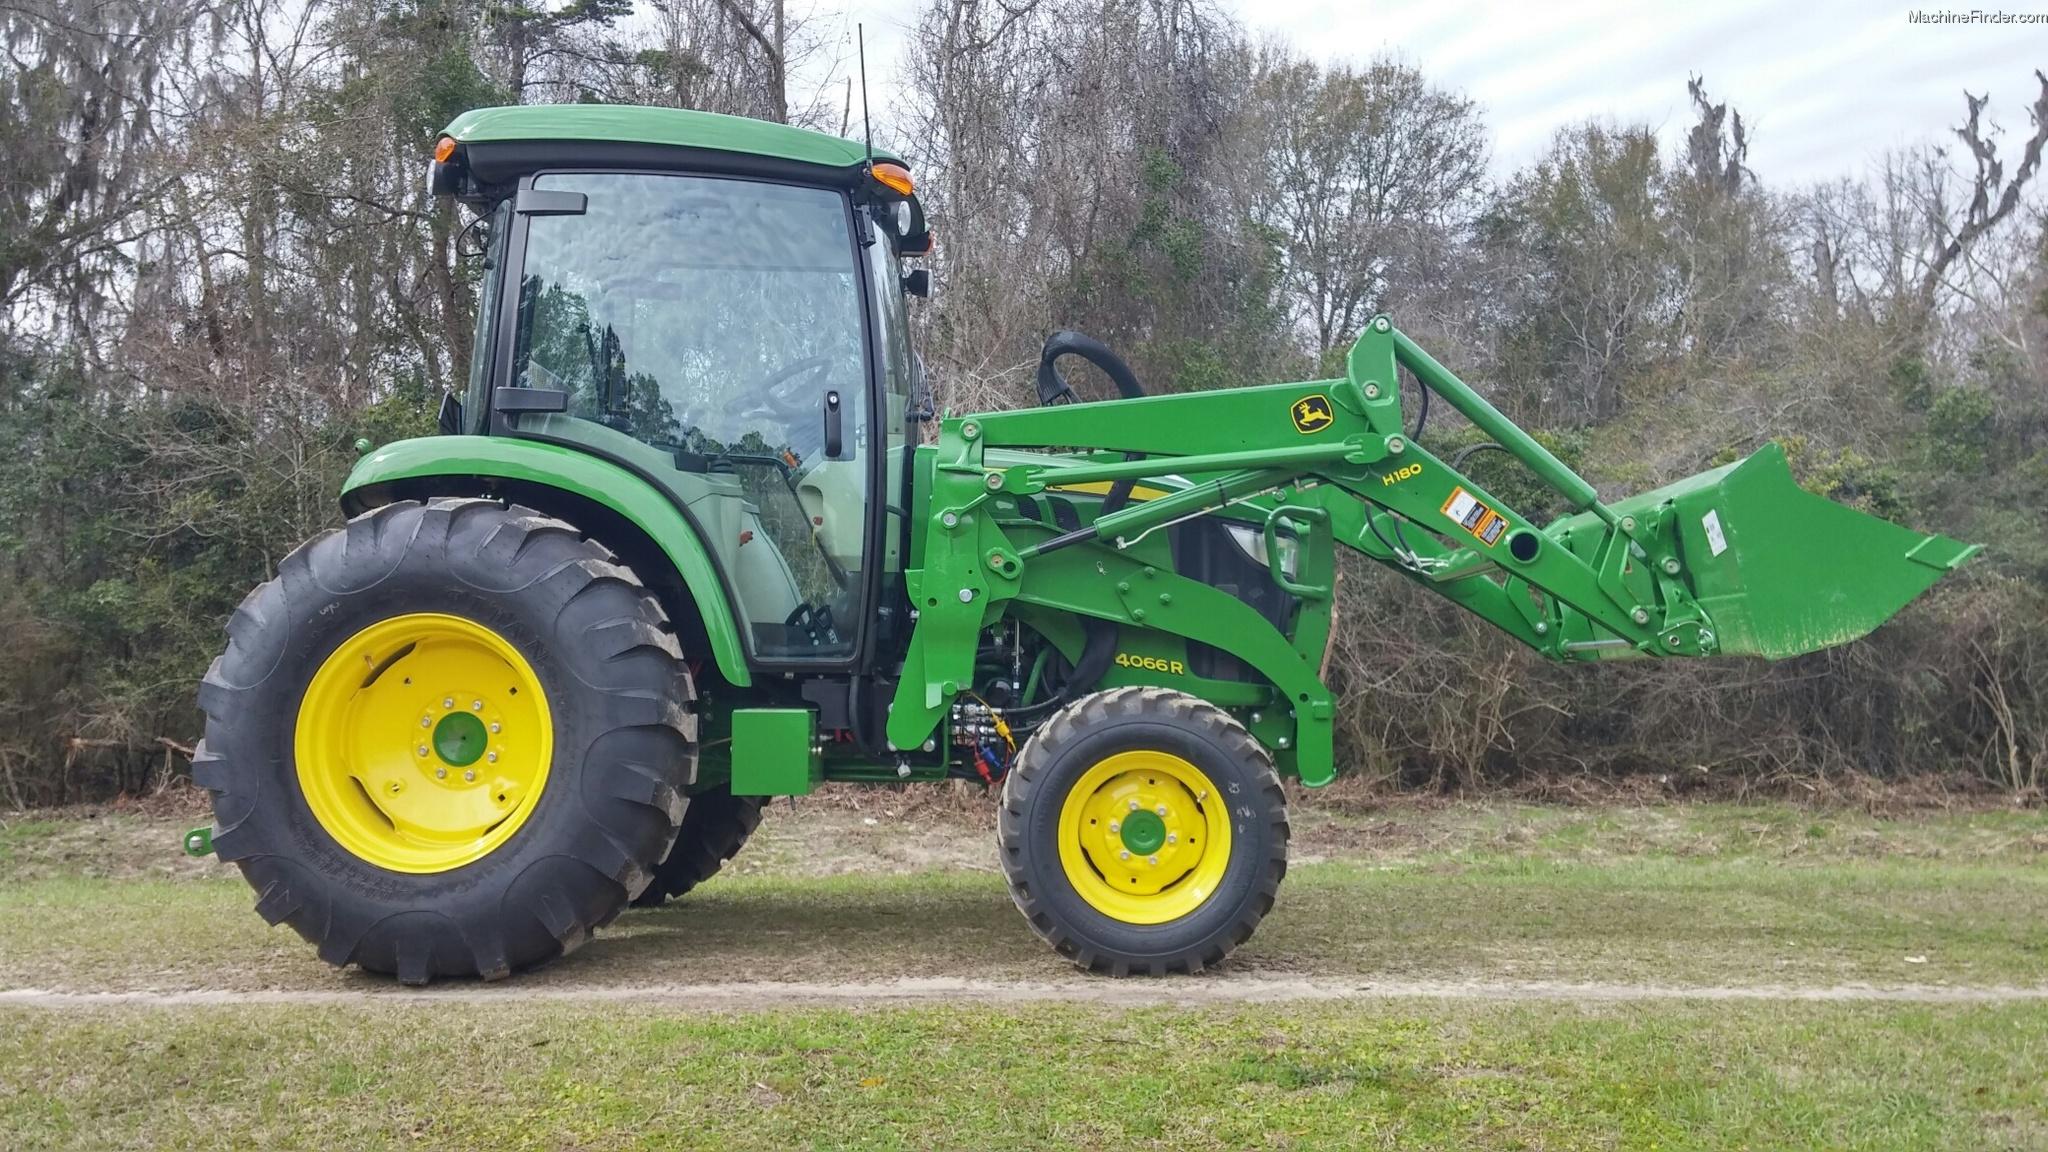 2014 John Deere 4066R Tractors - Compact (1-40hp.) - John ...